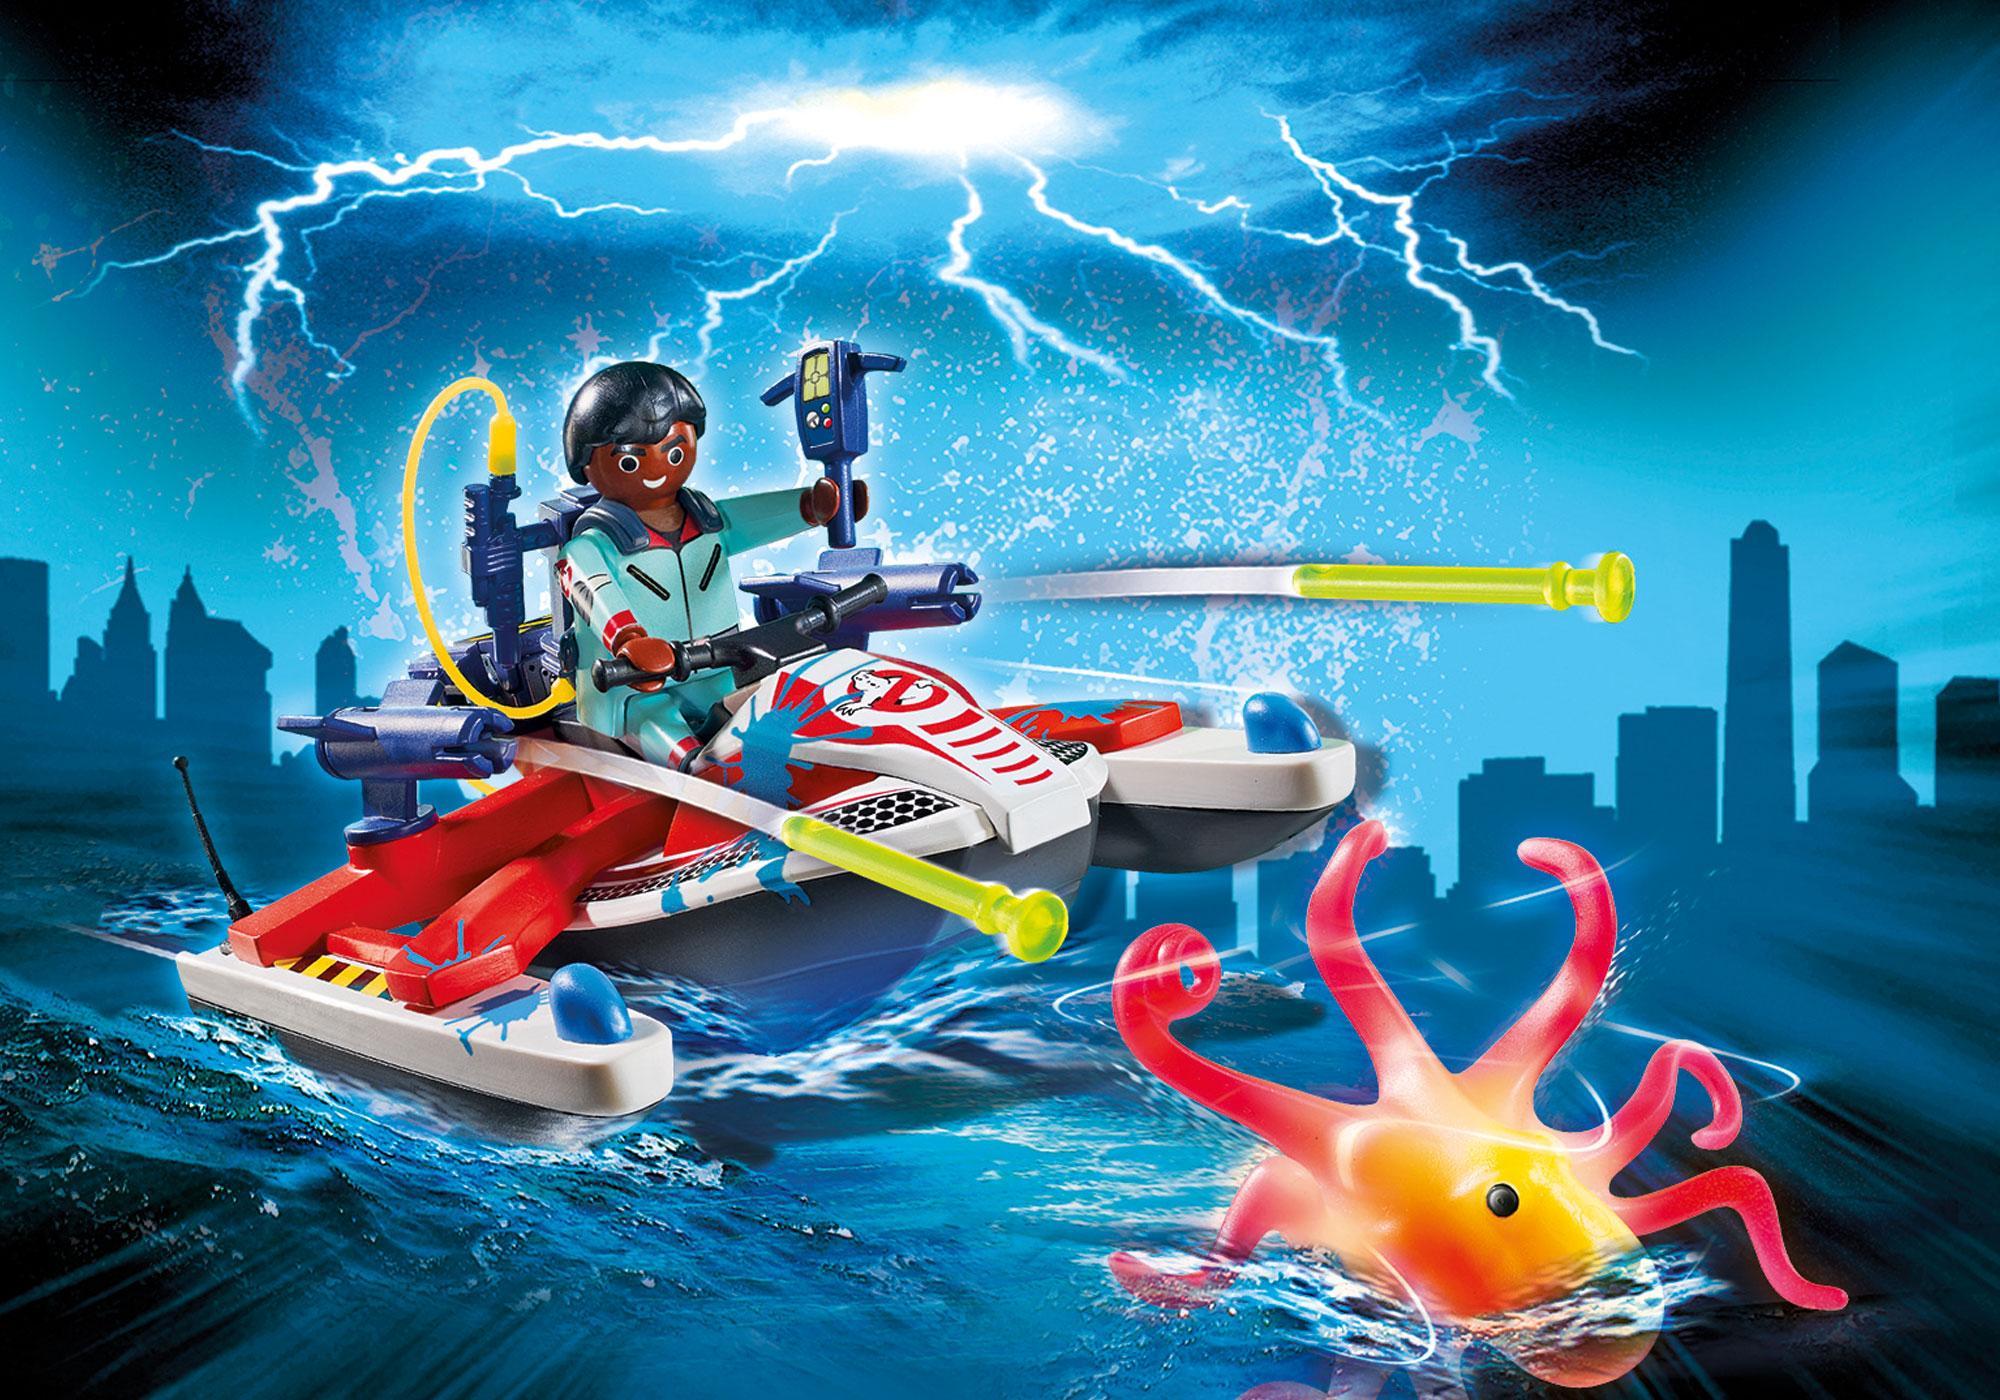 http://media.playmobil.com/i/playmobil/9387_product_detail/Zeddemore met waterscooter